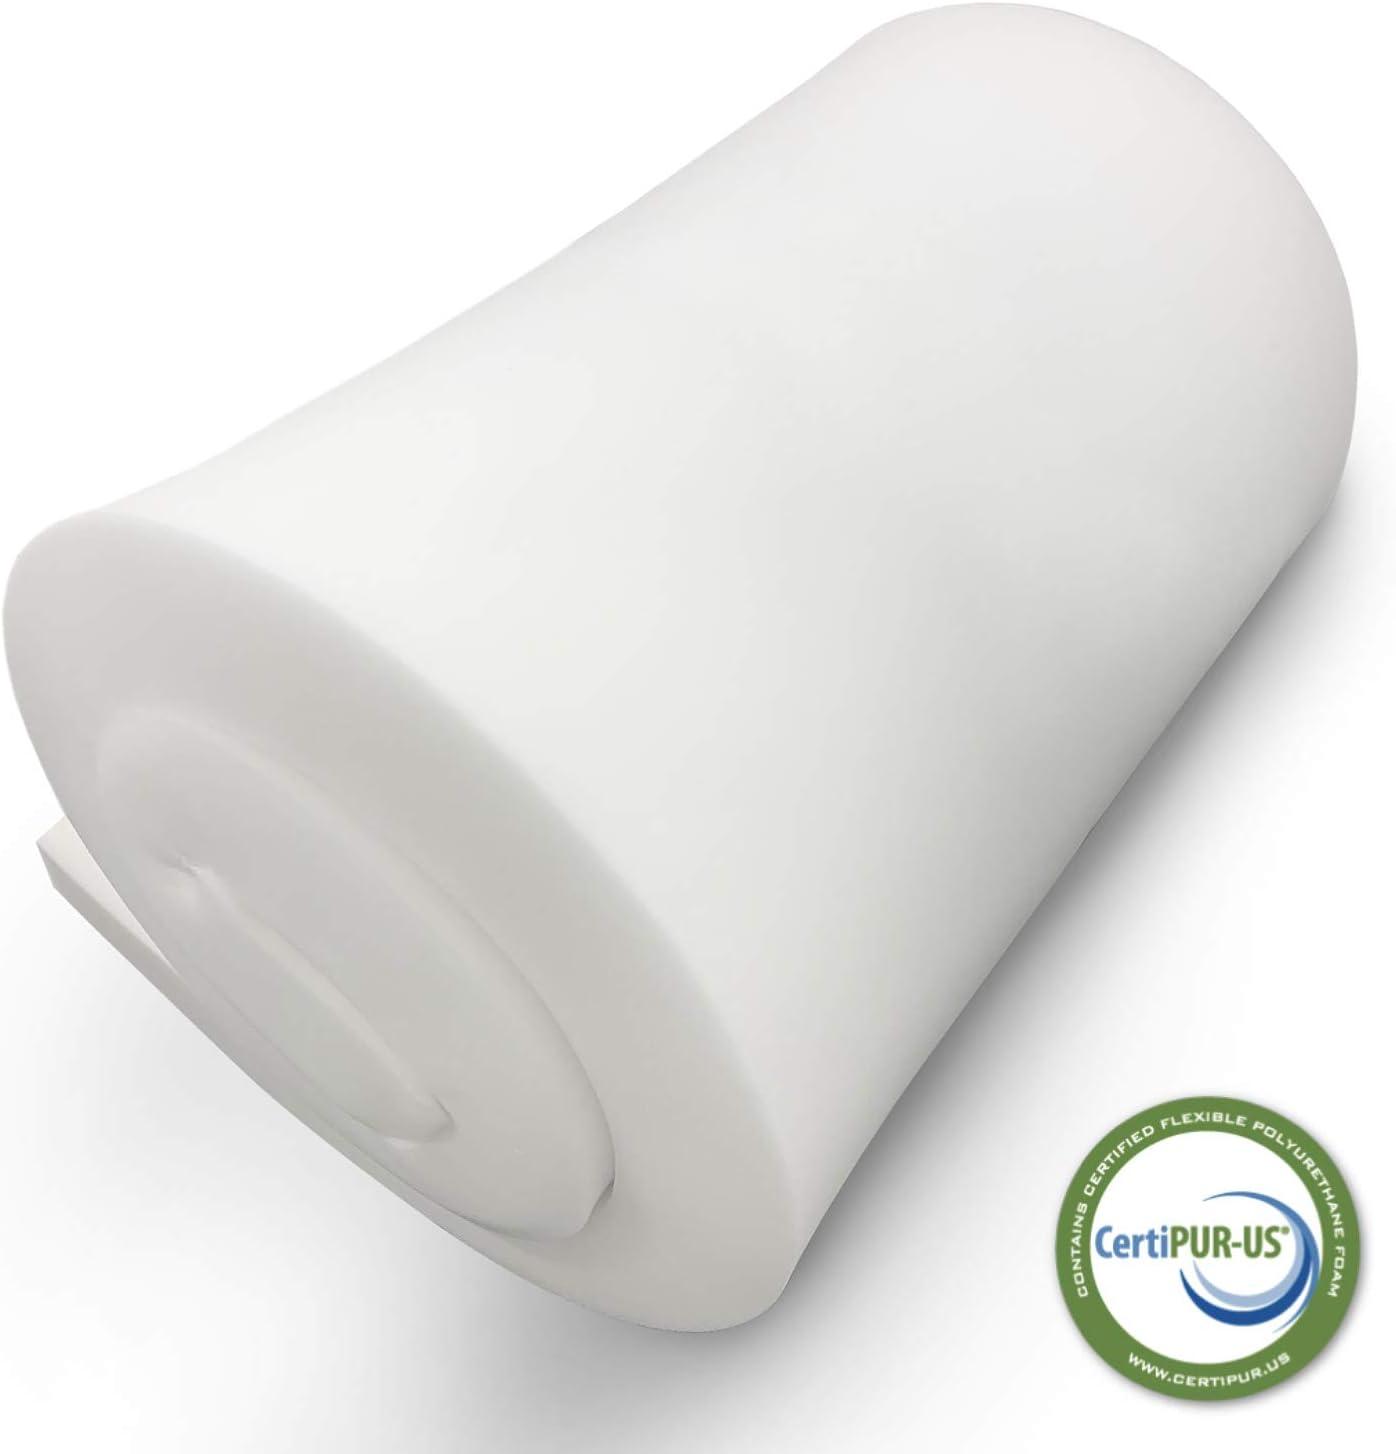 FOAMSPOT 4 Height x 30 Width x 72 Length 1.8 Density 44ILD Upholstery Foam Cushion Made in USA Firm